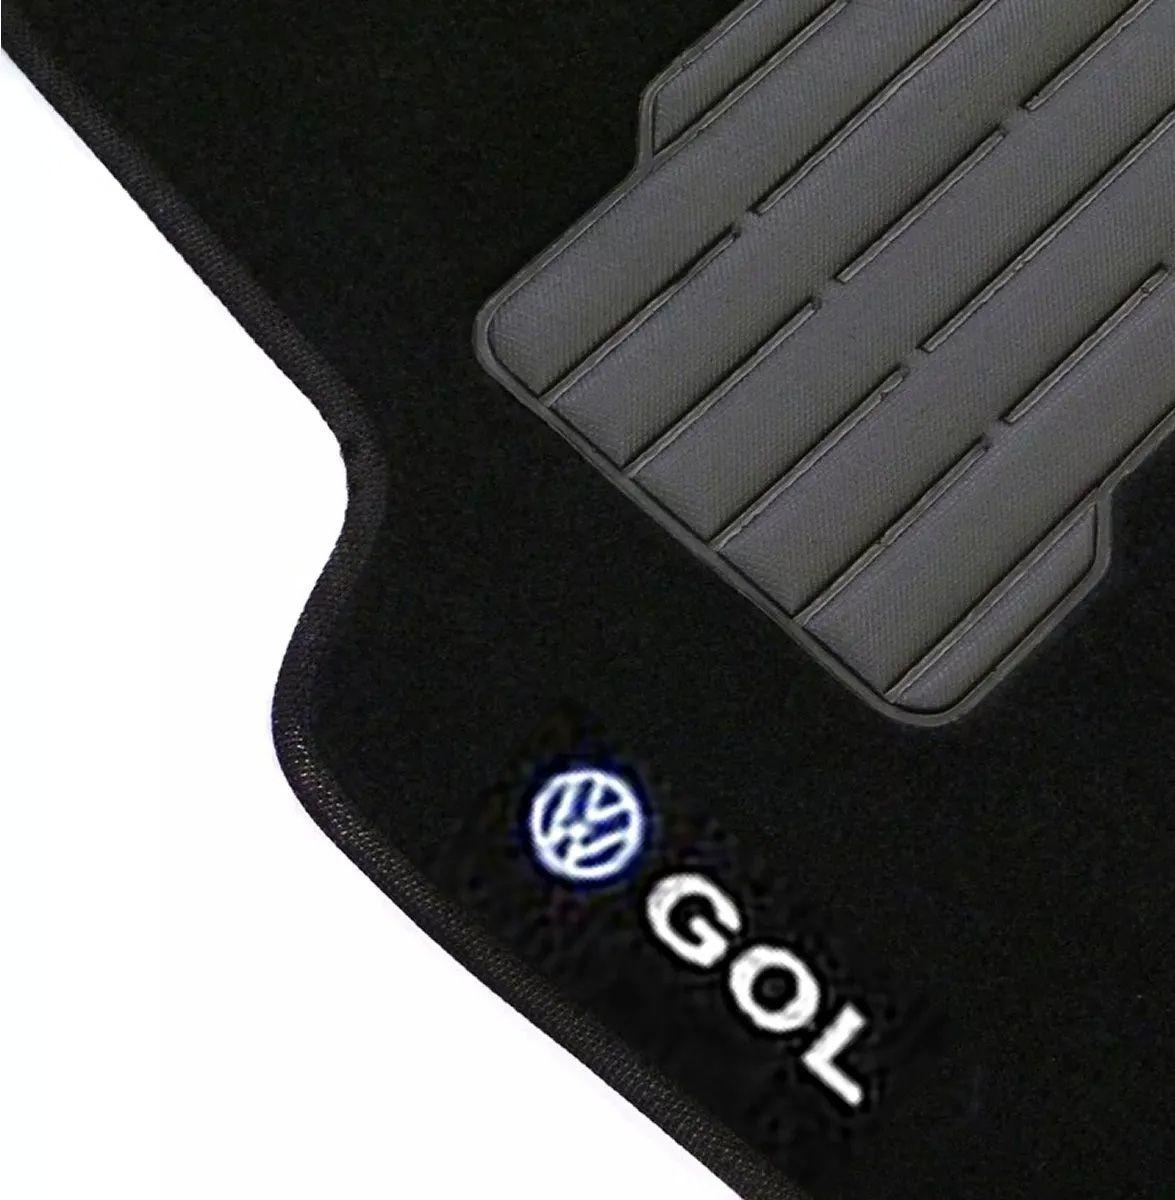 Jogo de Tapete Carpete Automotivo Gol G5 G6 Logo Bordado Volkswagen Preto Personalizado Vw